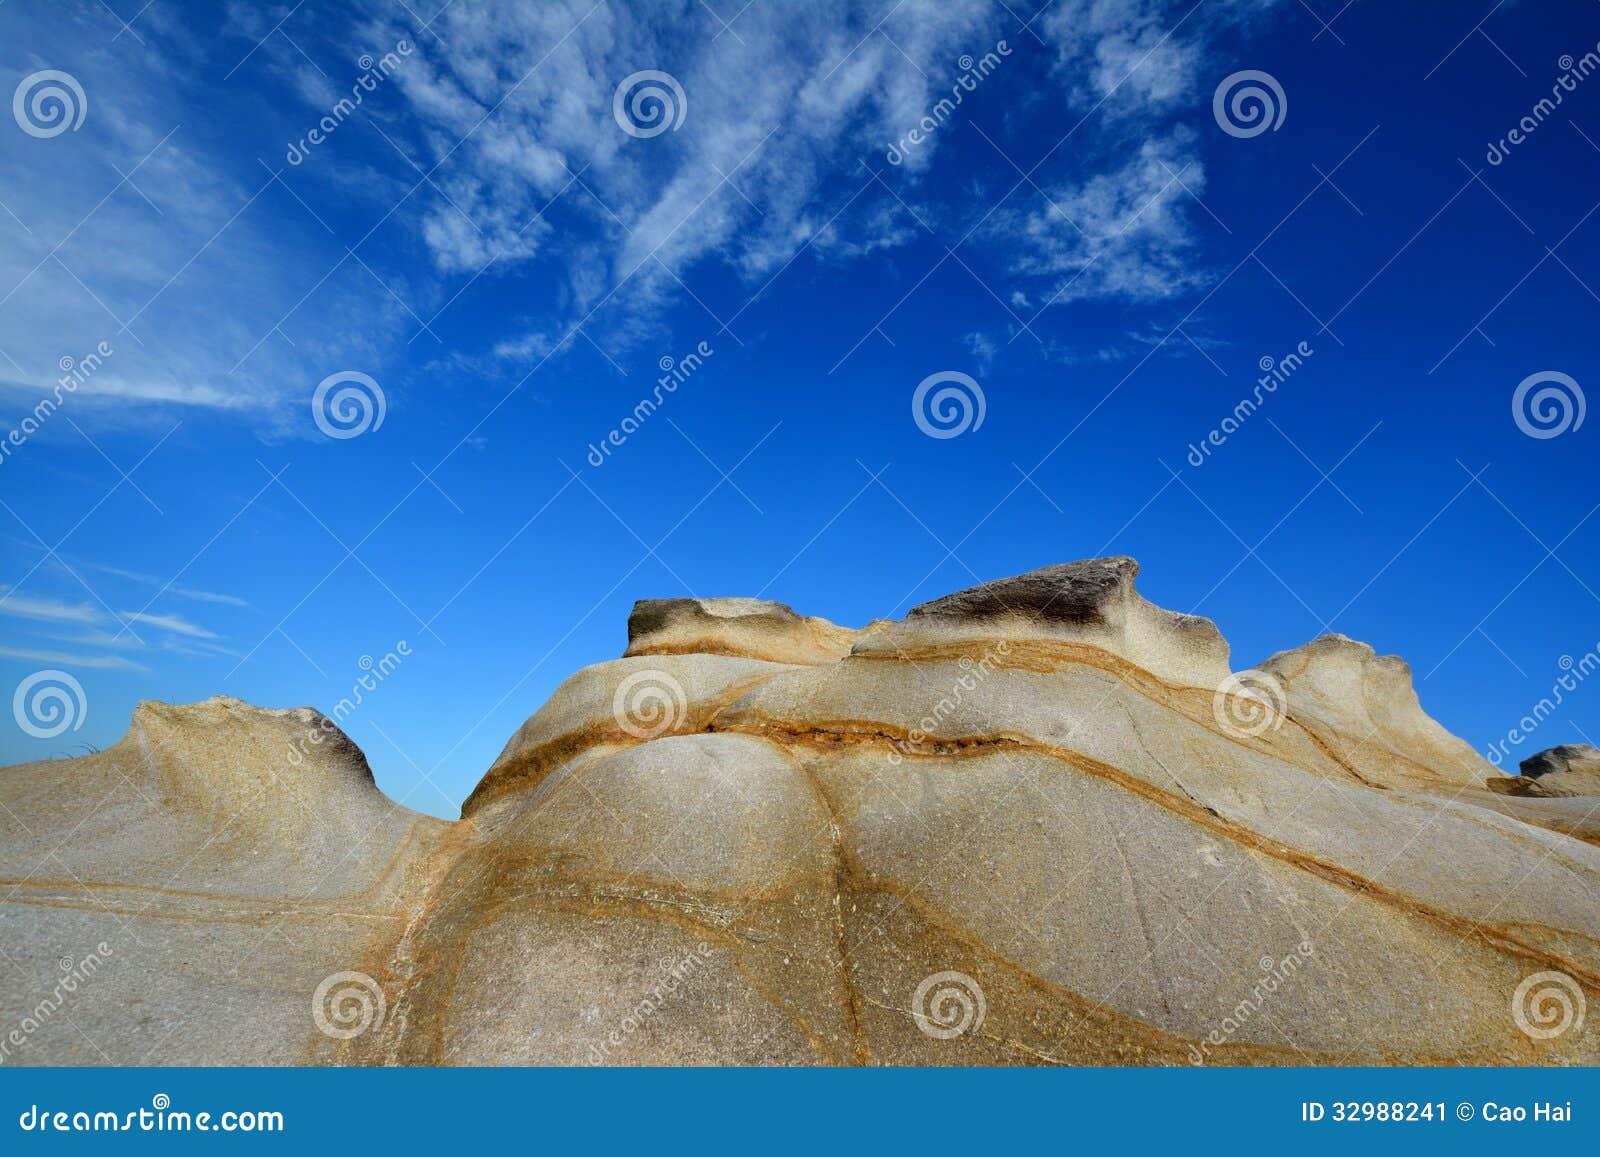 Presenterat rida ut granit under himmel, Fujian, Kina